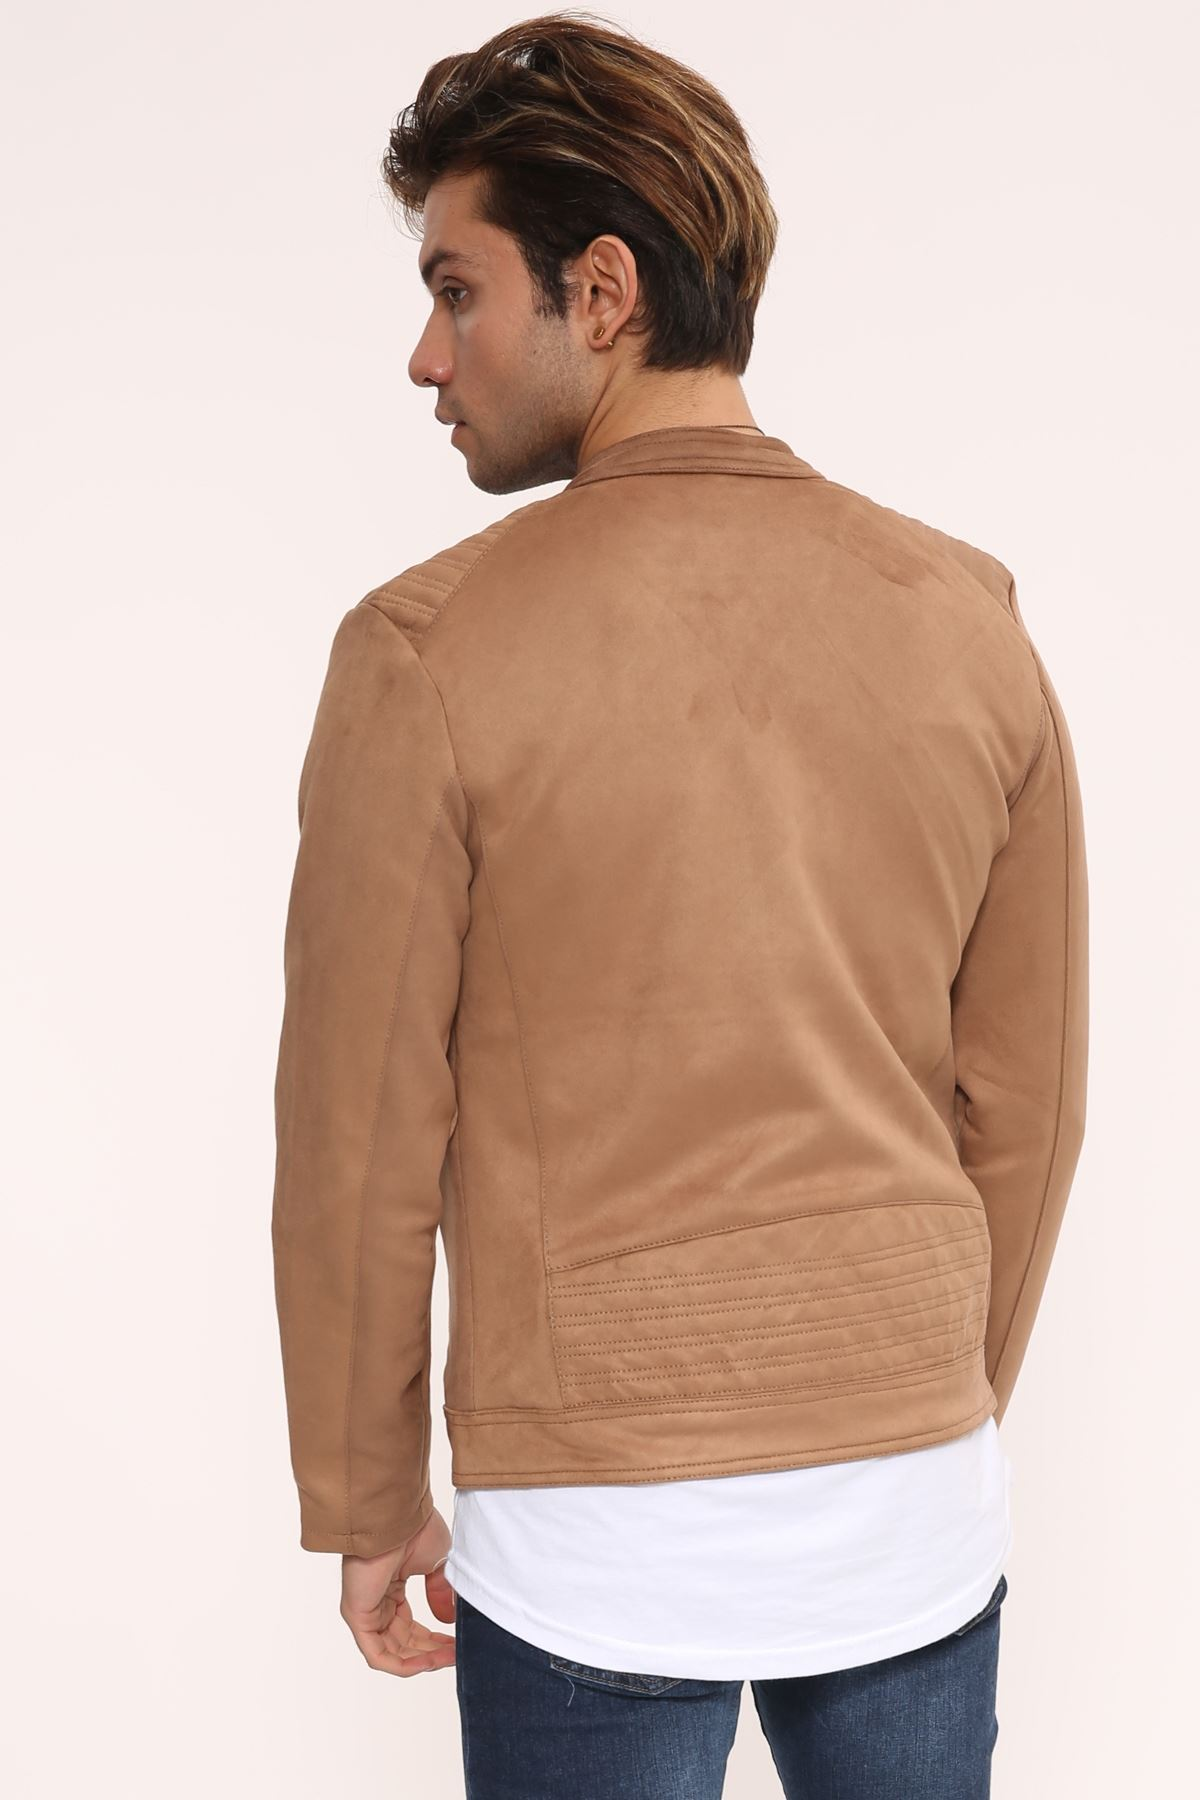 Fermuar Detay Açık Taba Süet Erkek Ceket